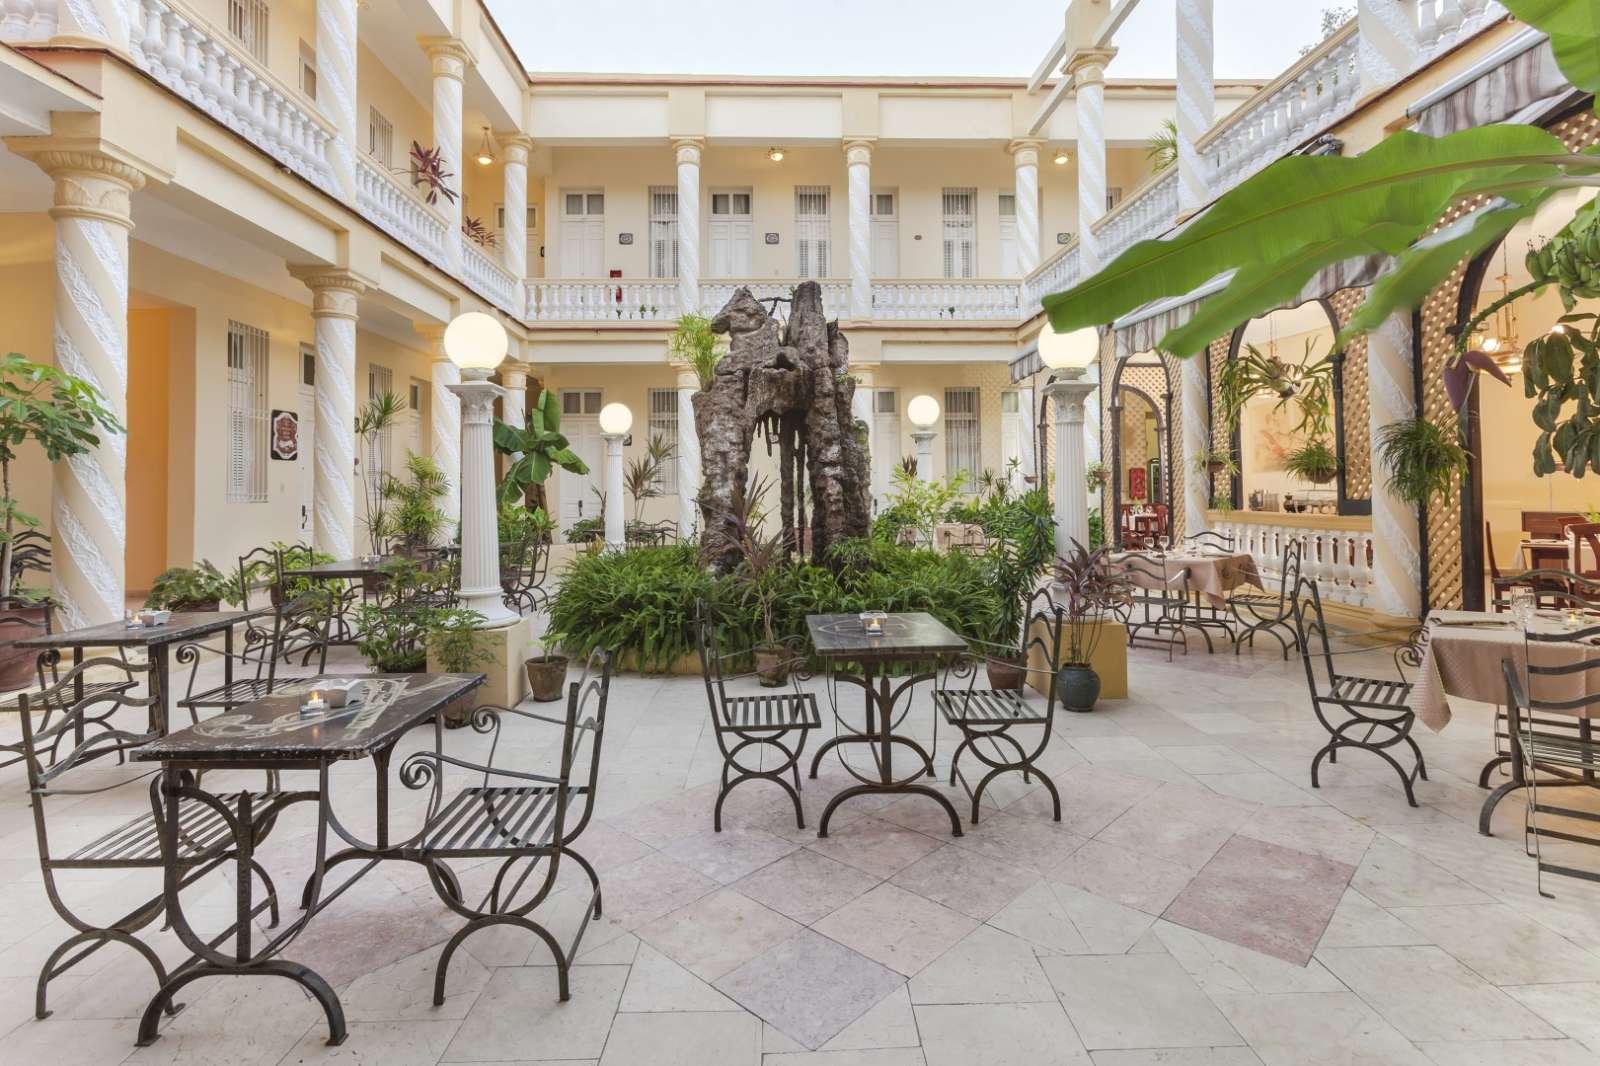 Courtyard of Melia Colon in Camaguey